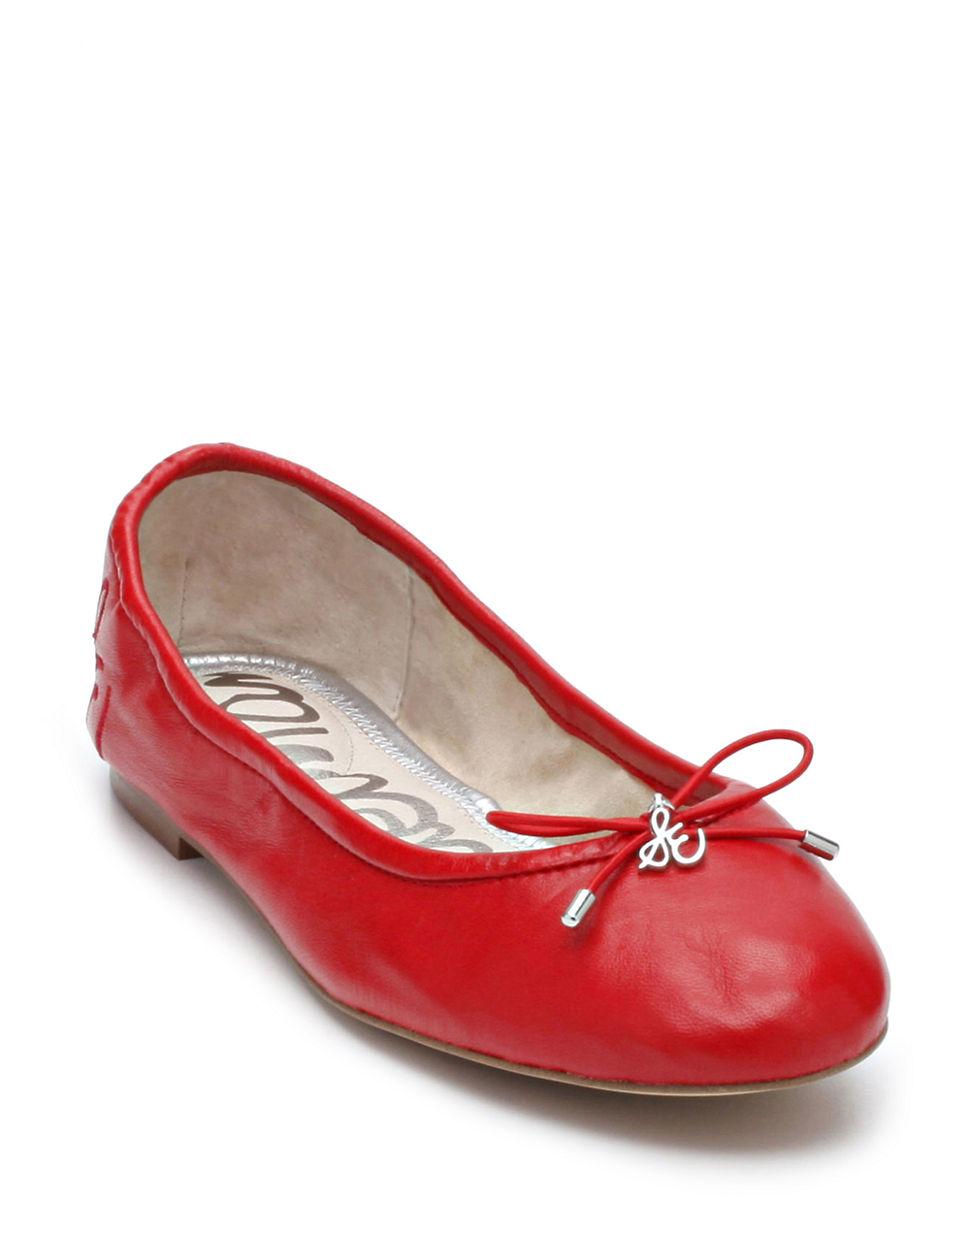 85976699f420f4 Sam Edelman Felicia Leather Flats in Red - Lyst